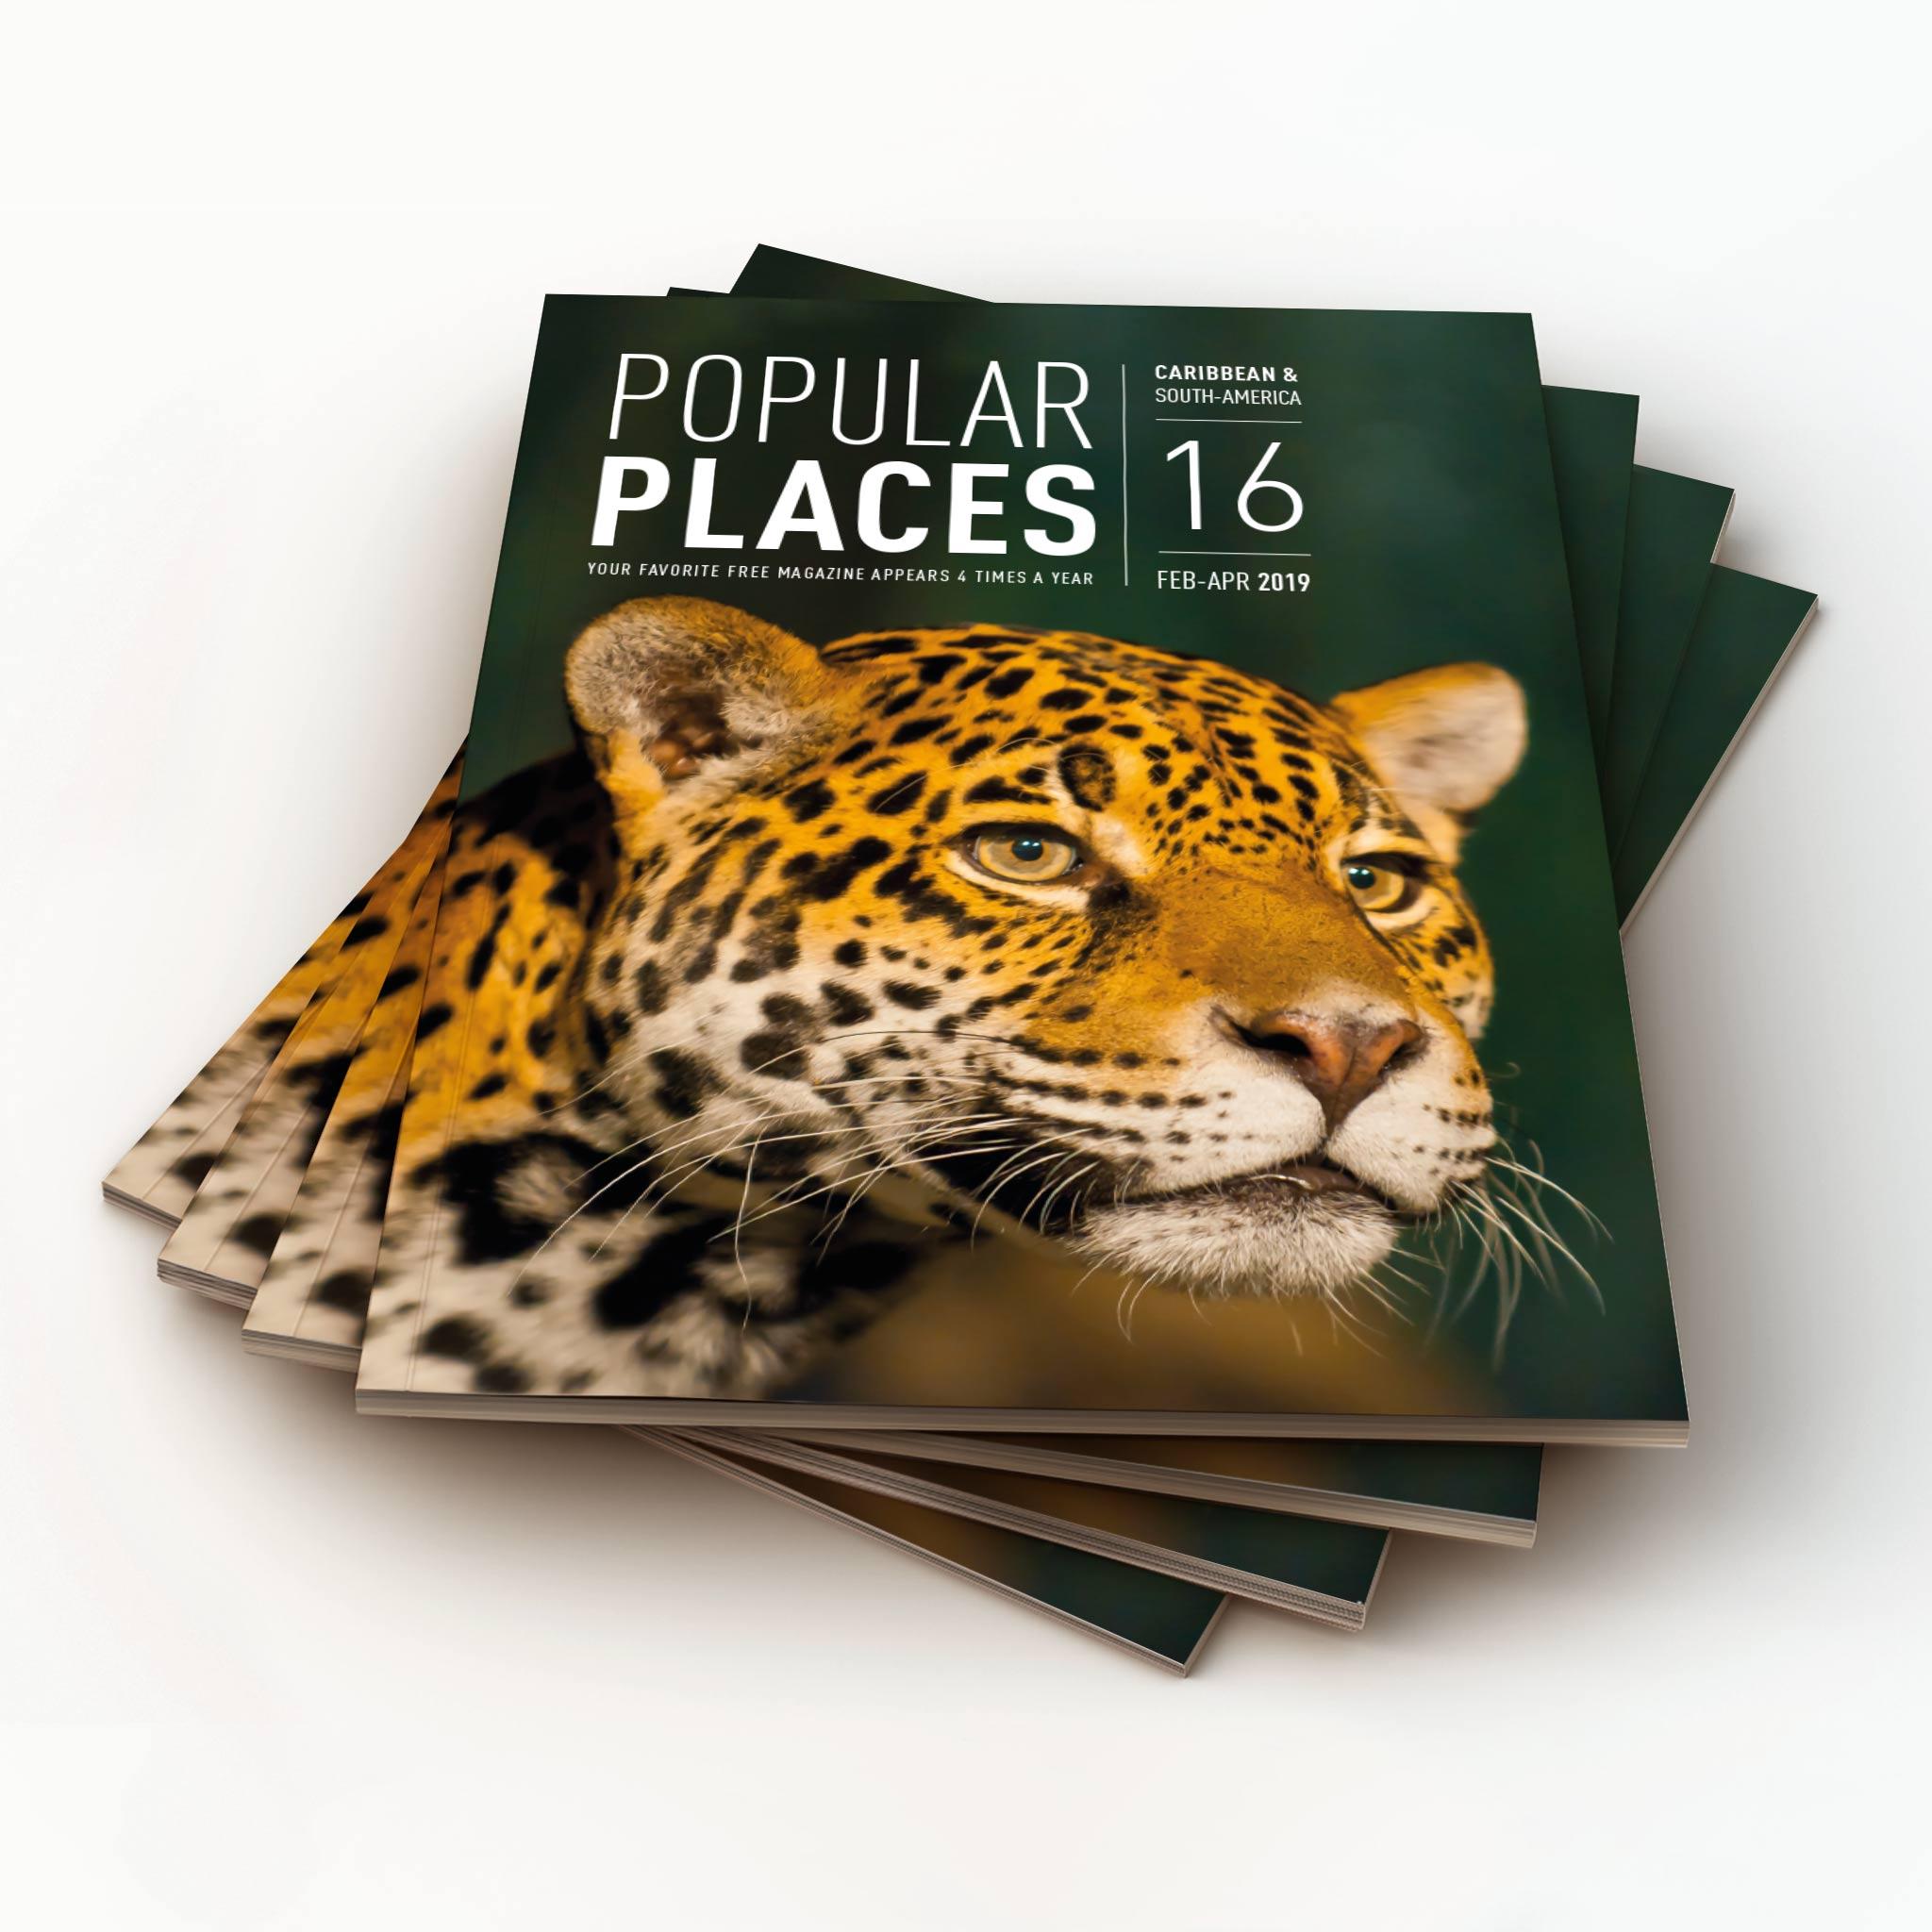 Popular Places 16